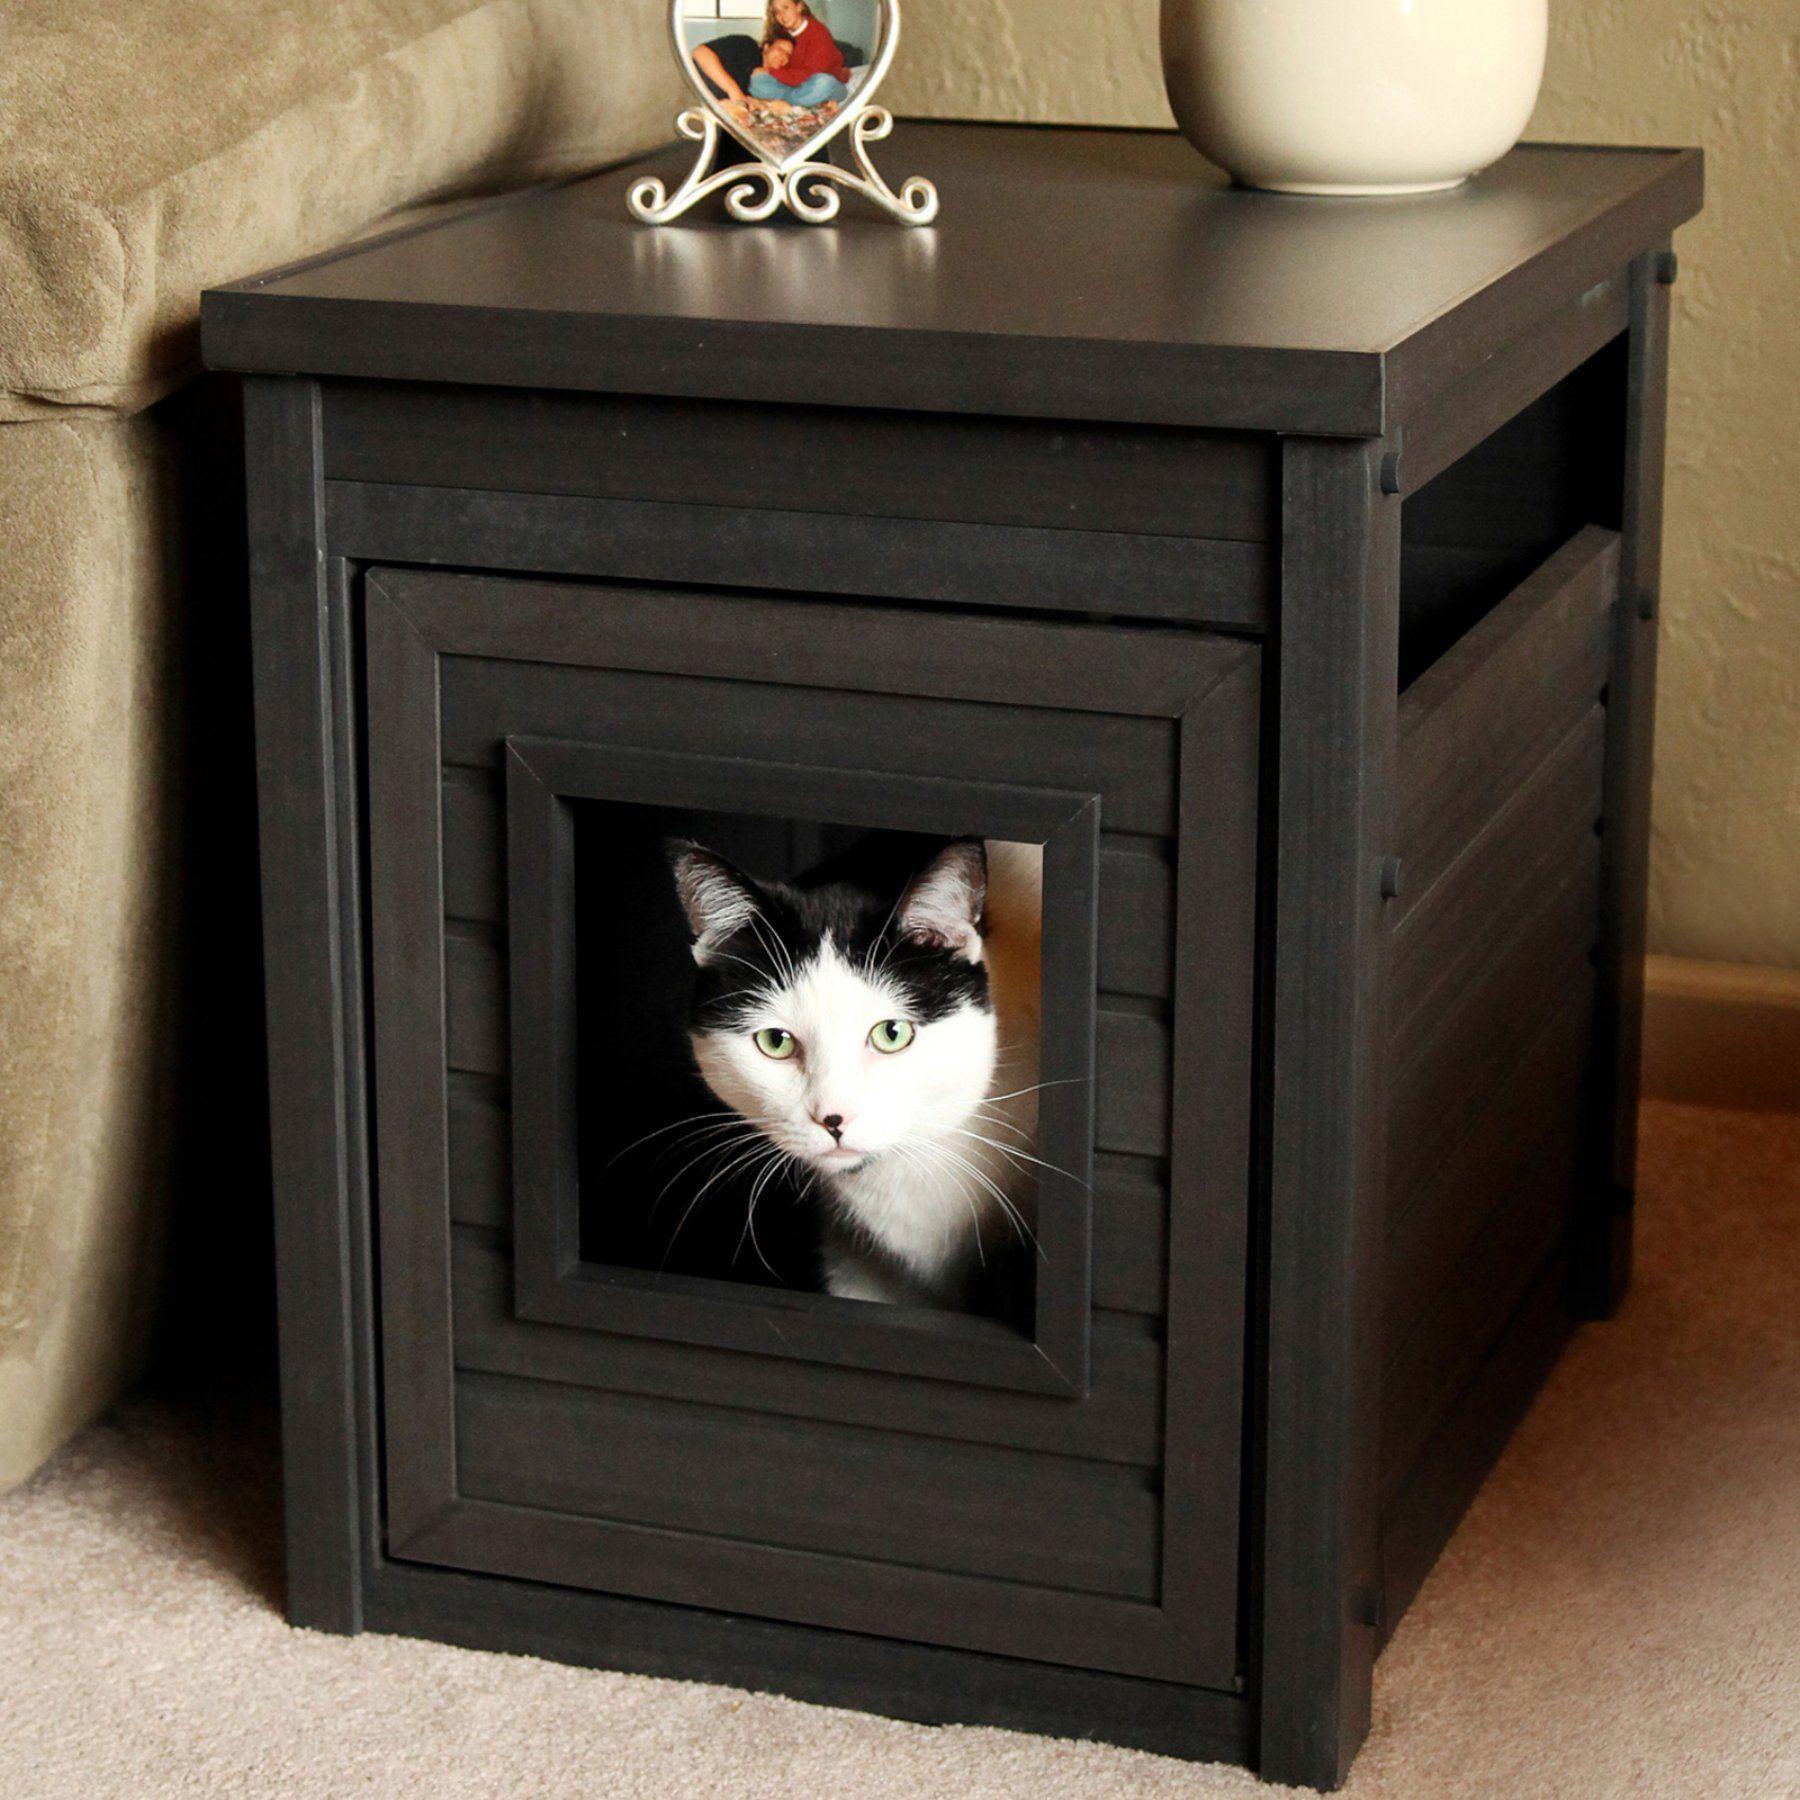 New Age Pet Habitat 'n Home Cat Litter Loo EHLB80102